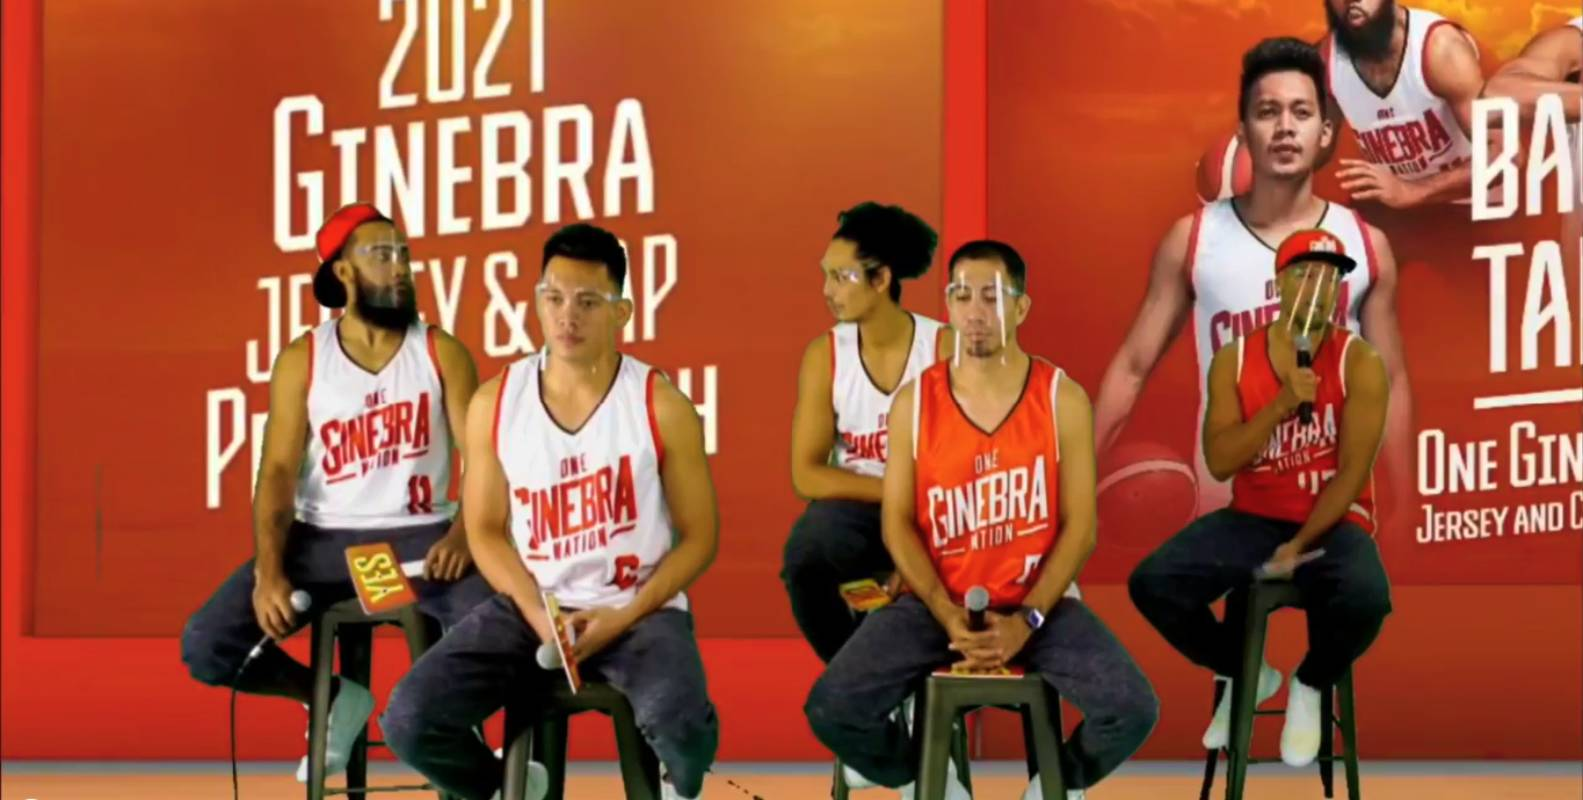 PBA-Season-46-One-Ginebra-Nation Ginebra unveils new 'One Ginebra Nation' jerseys Basketball News PBA  - philippine sports news